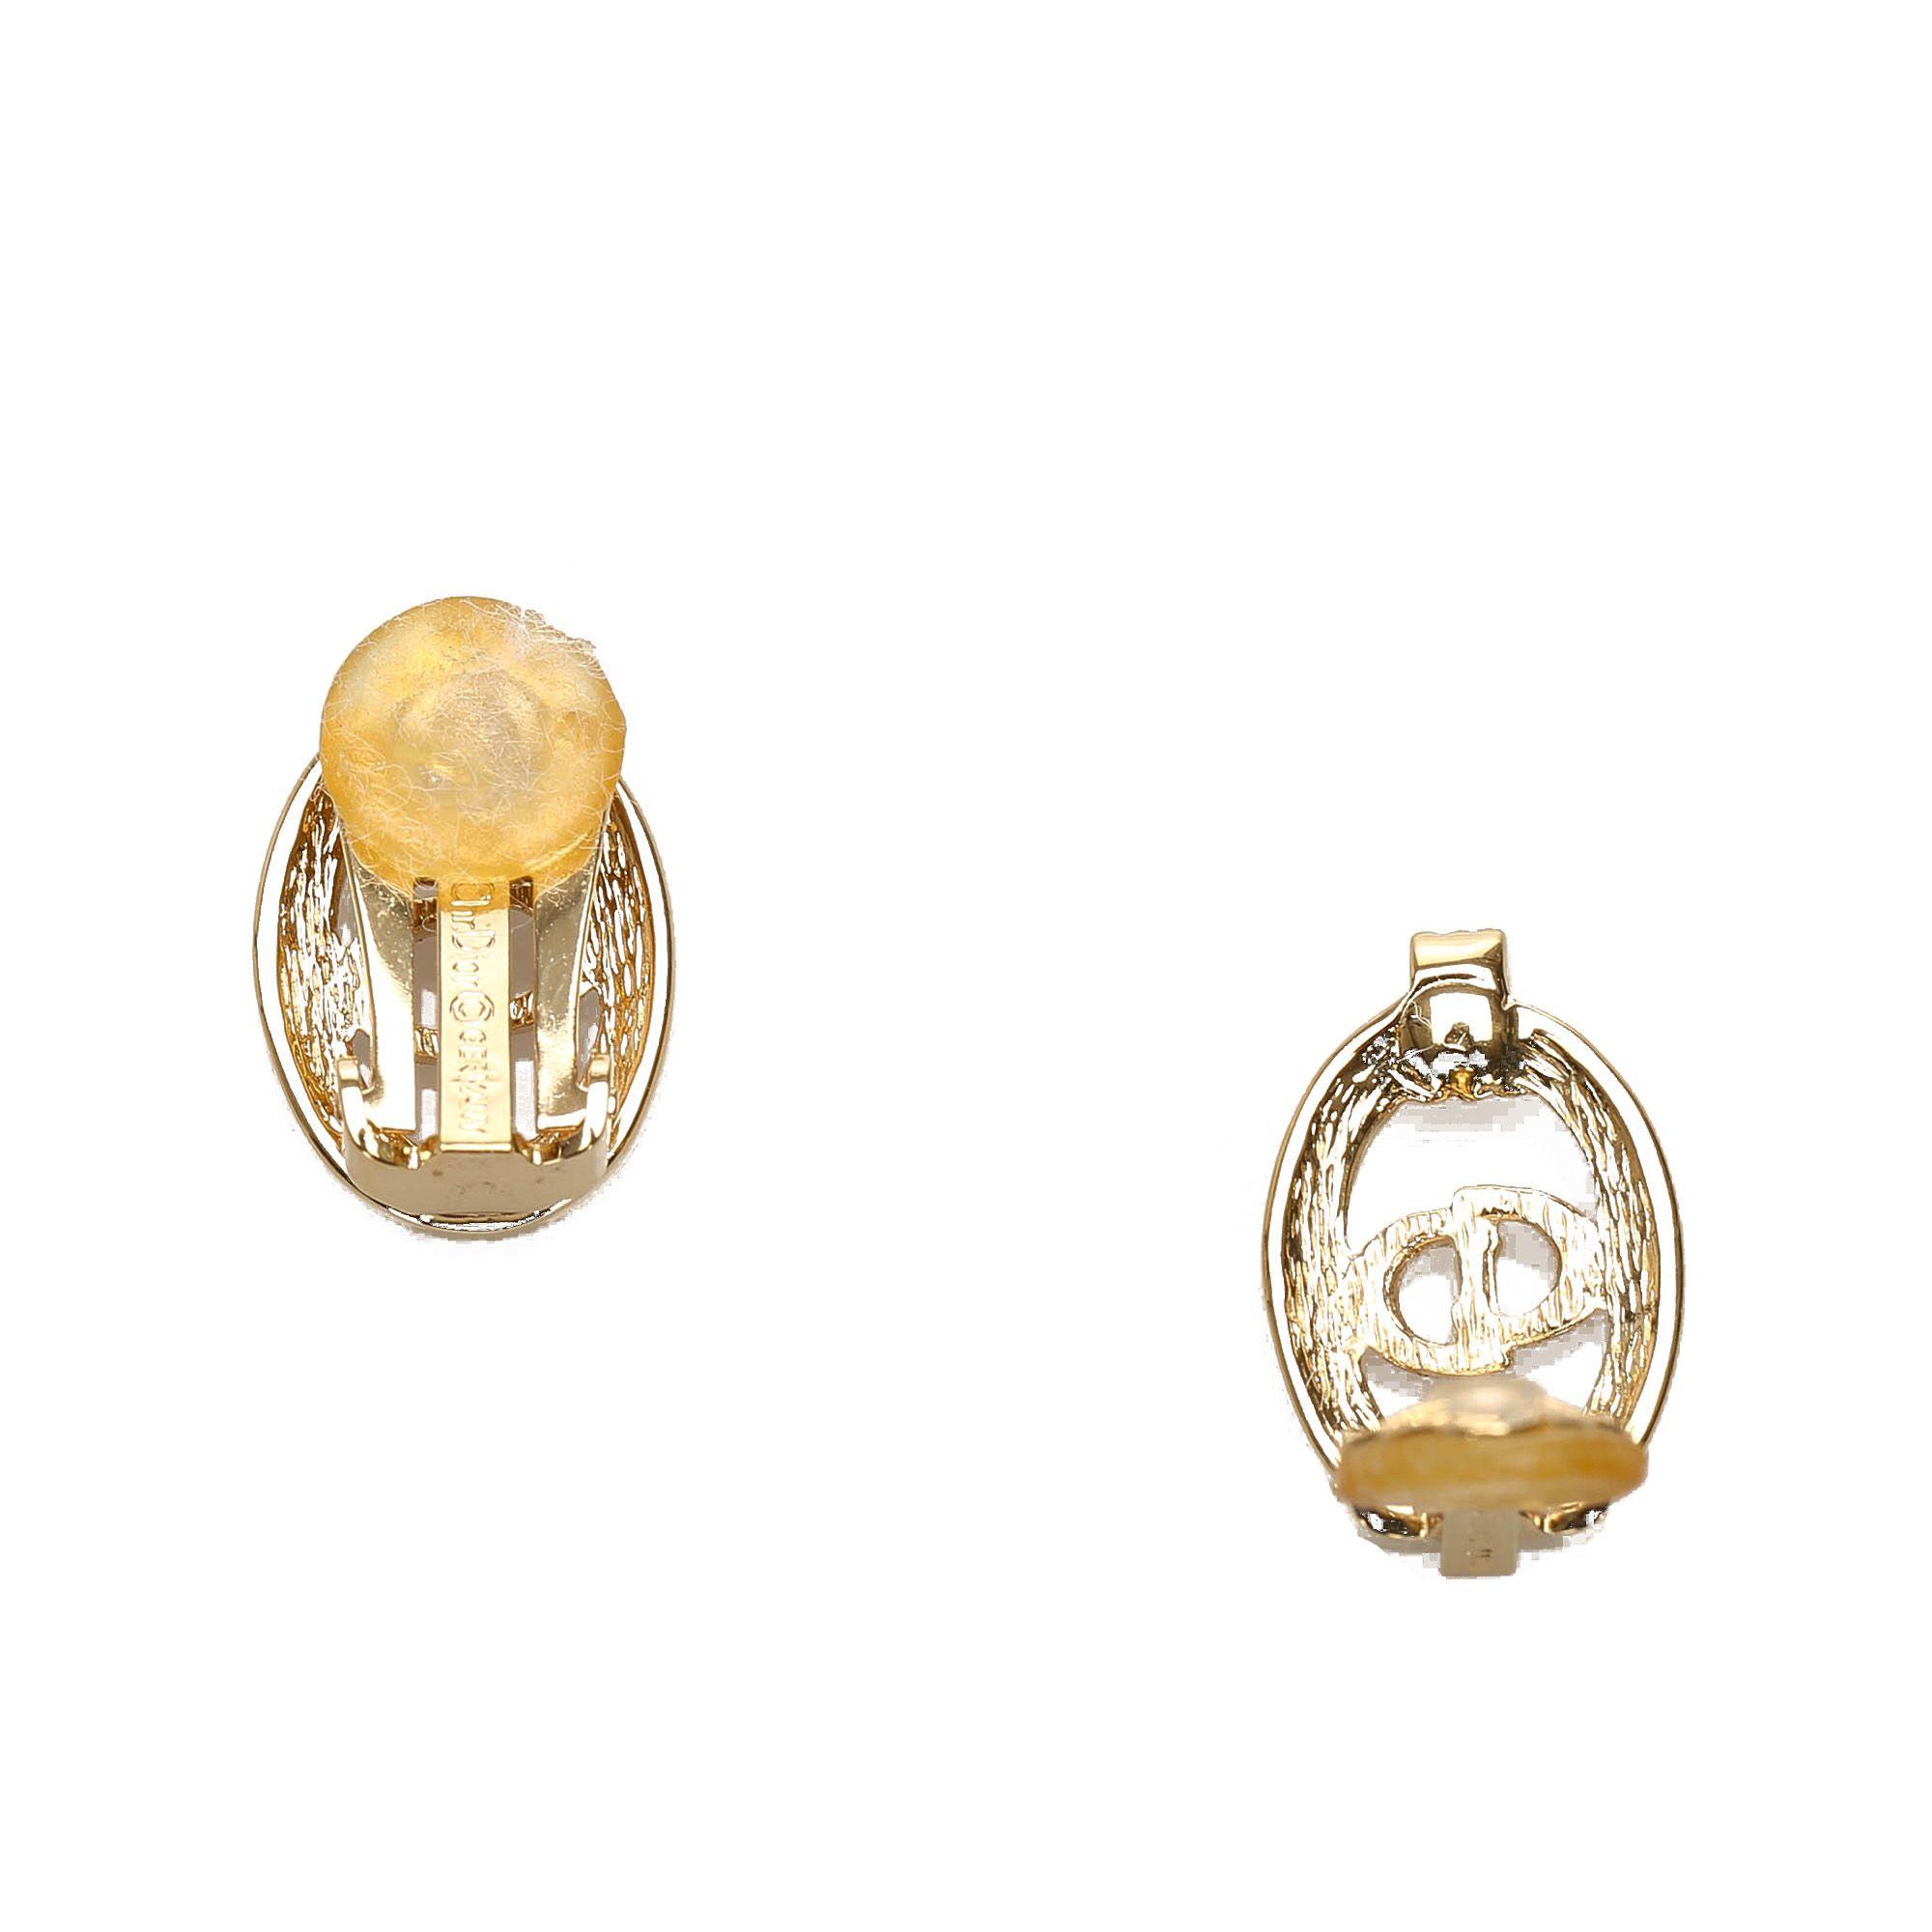 Vintage Dior Logo Rhinestone Clip-On Earrings Gold